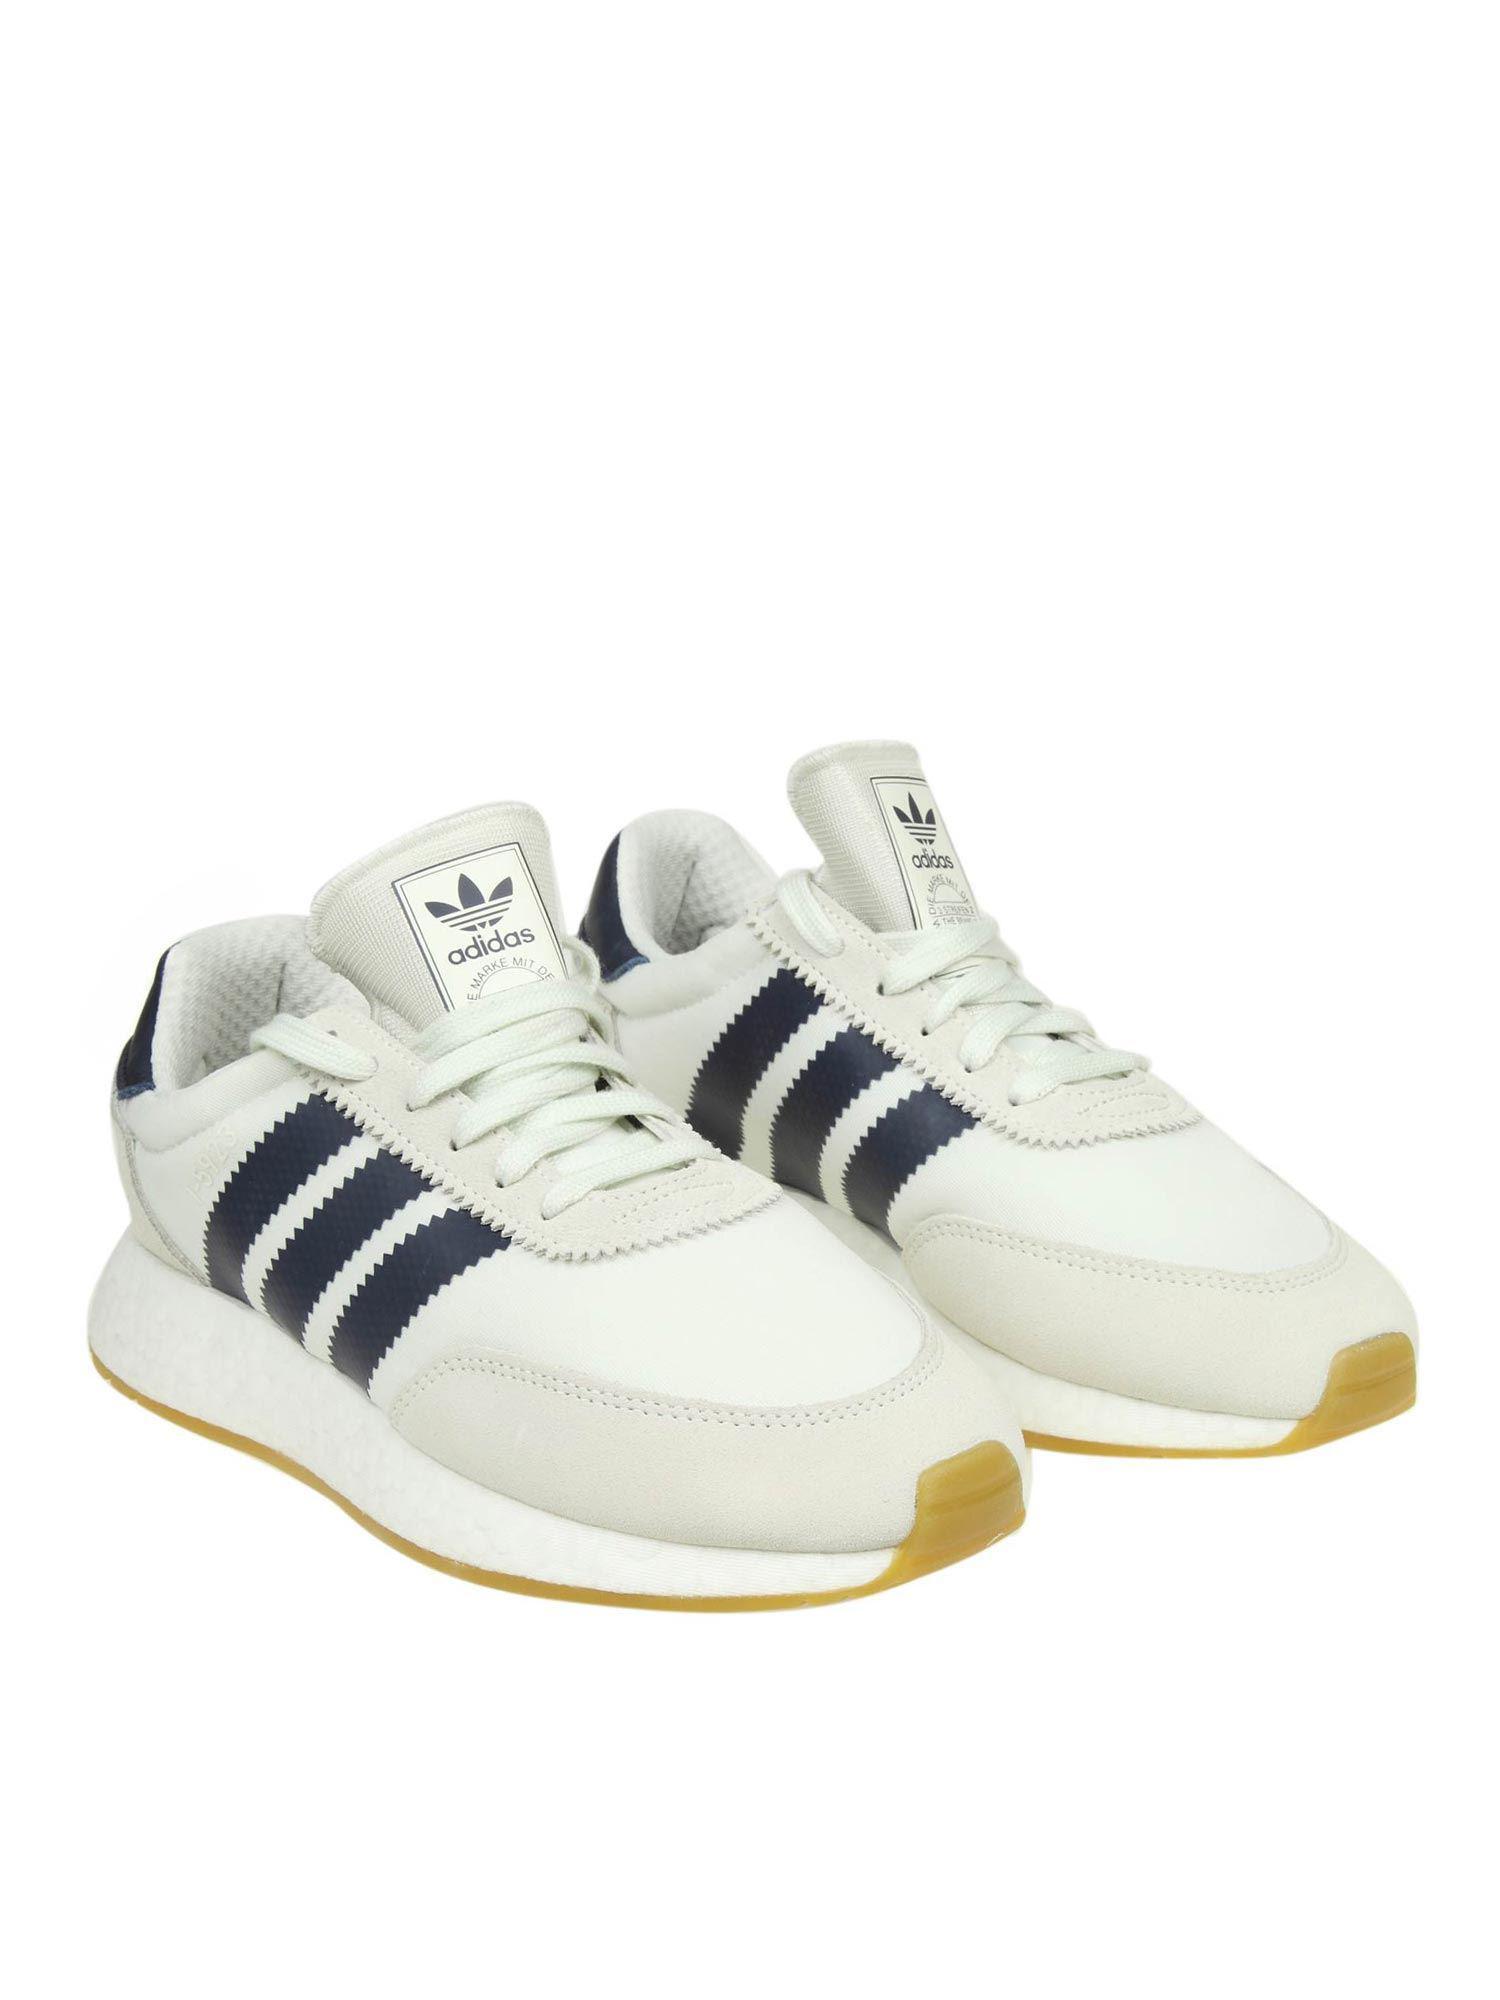 c22631605b8b44 Adidas Originals - White And Blue I-5923 Sneakers for Men - Lyst. View  fullscreen